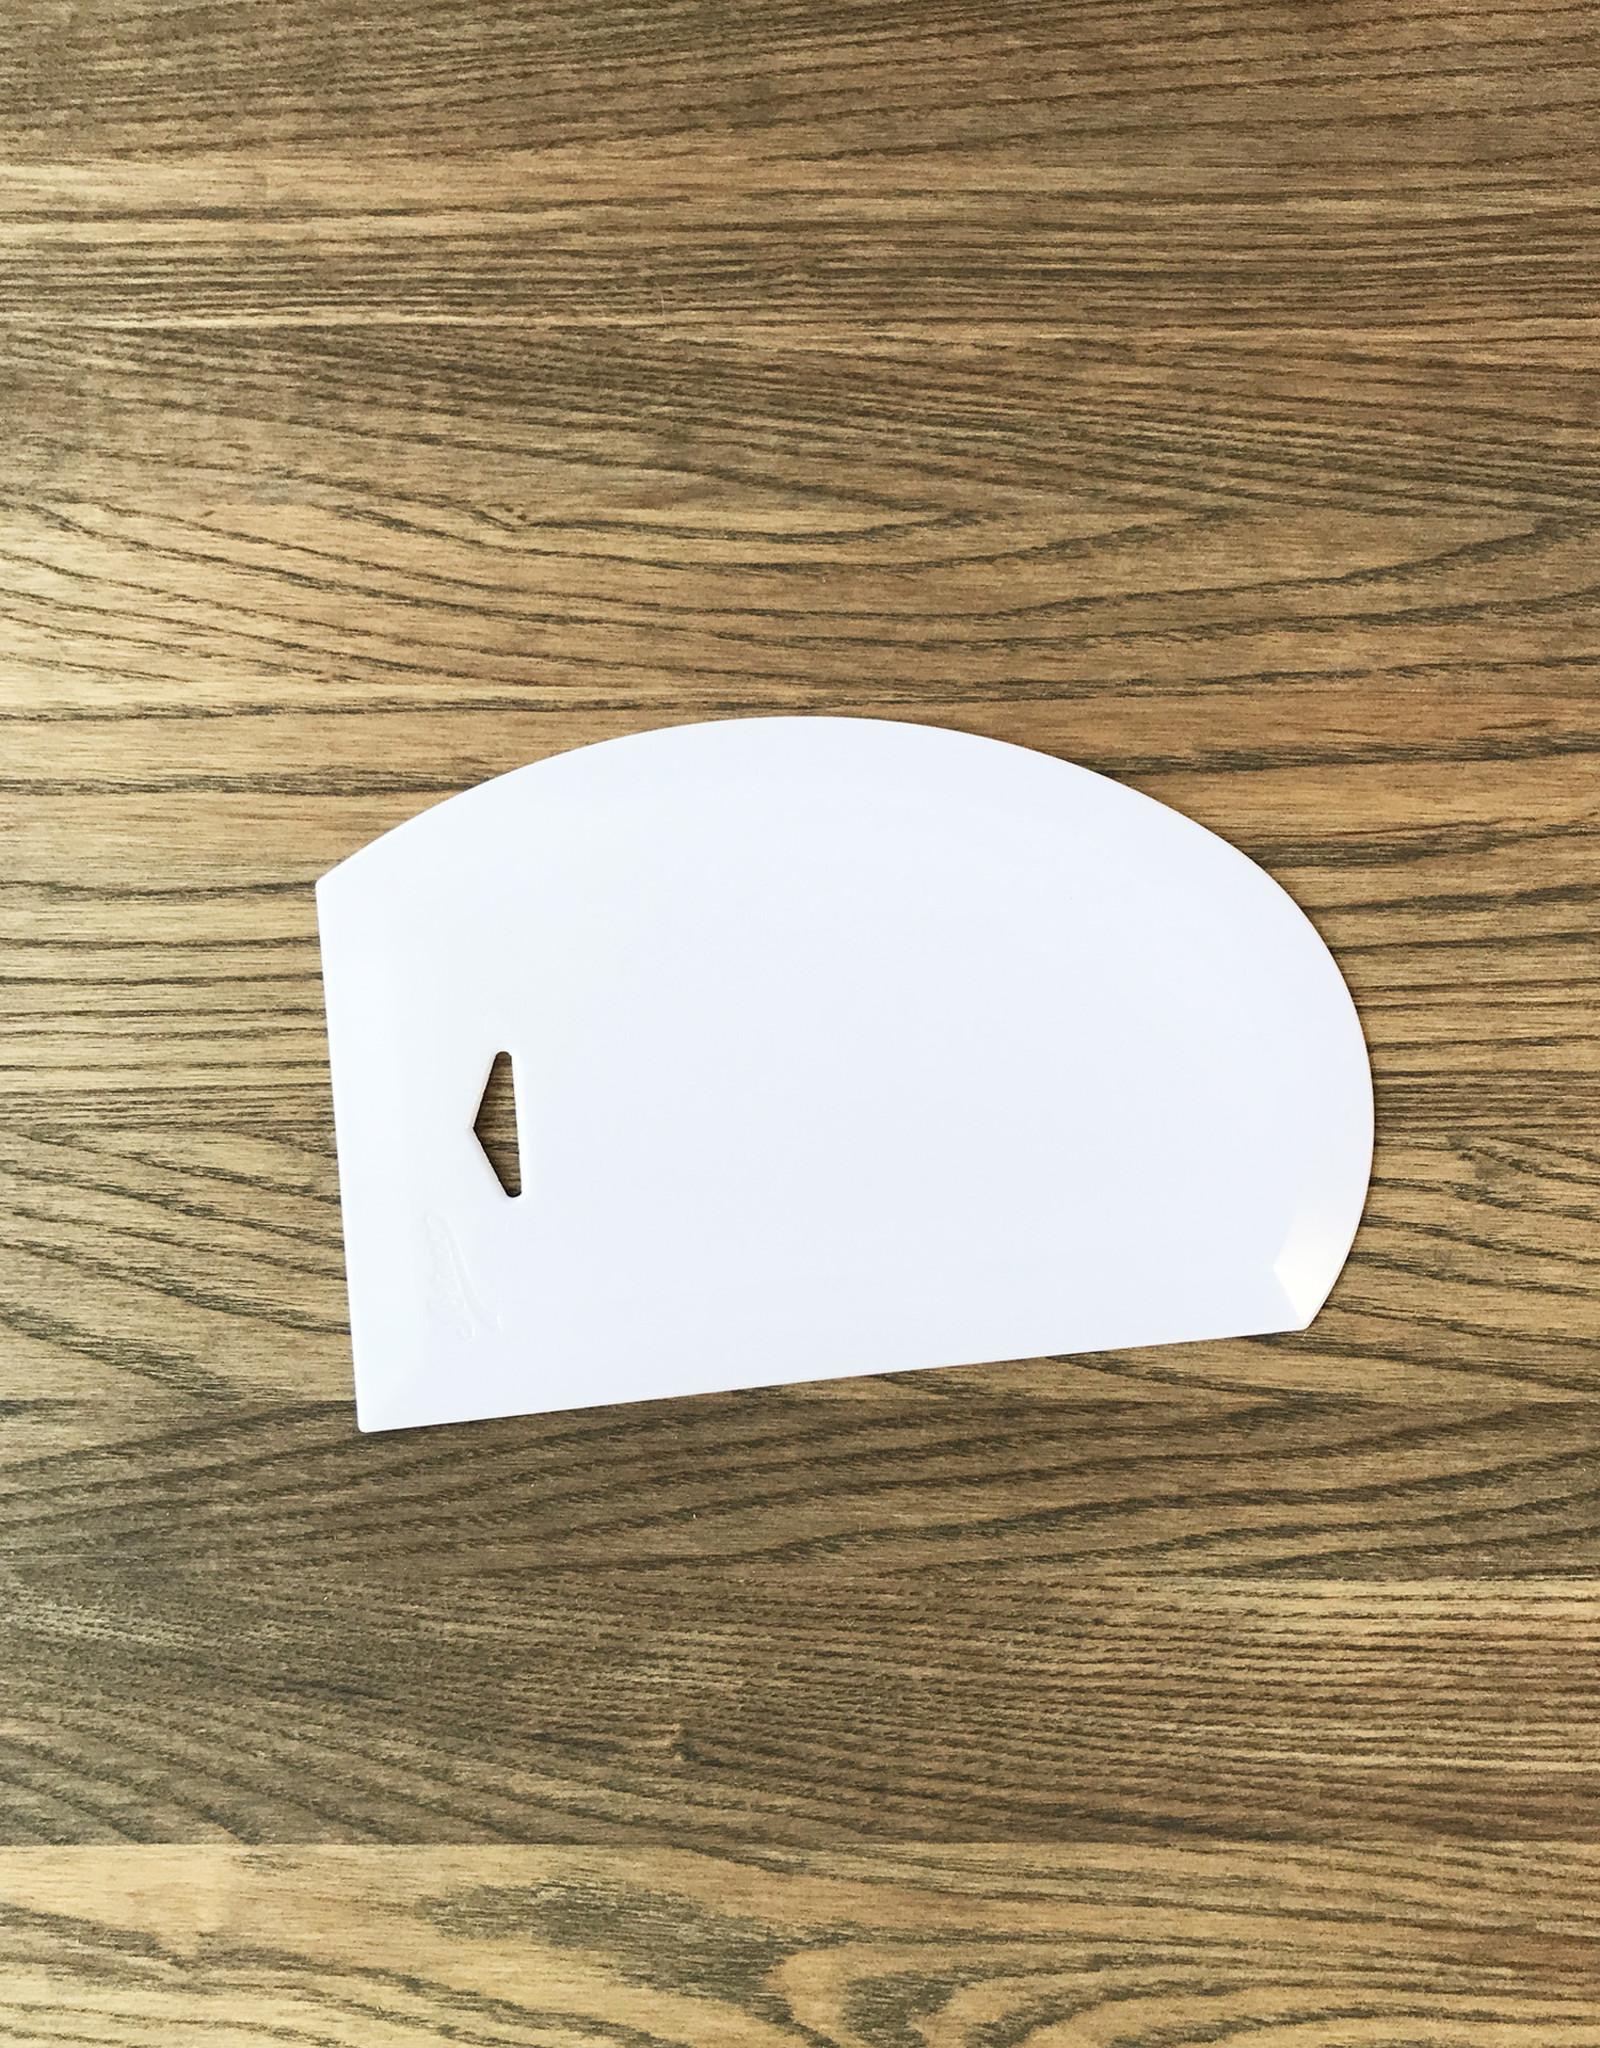 Ateco Ateco Large Plastic Bowl Scraper